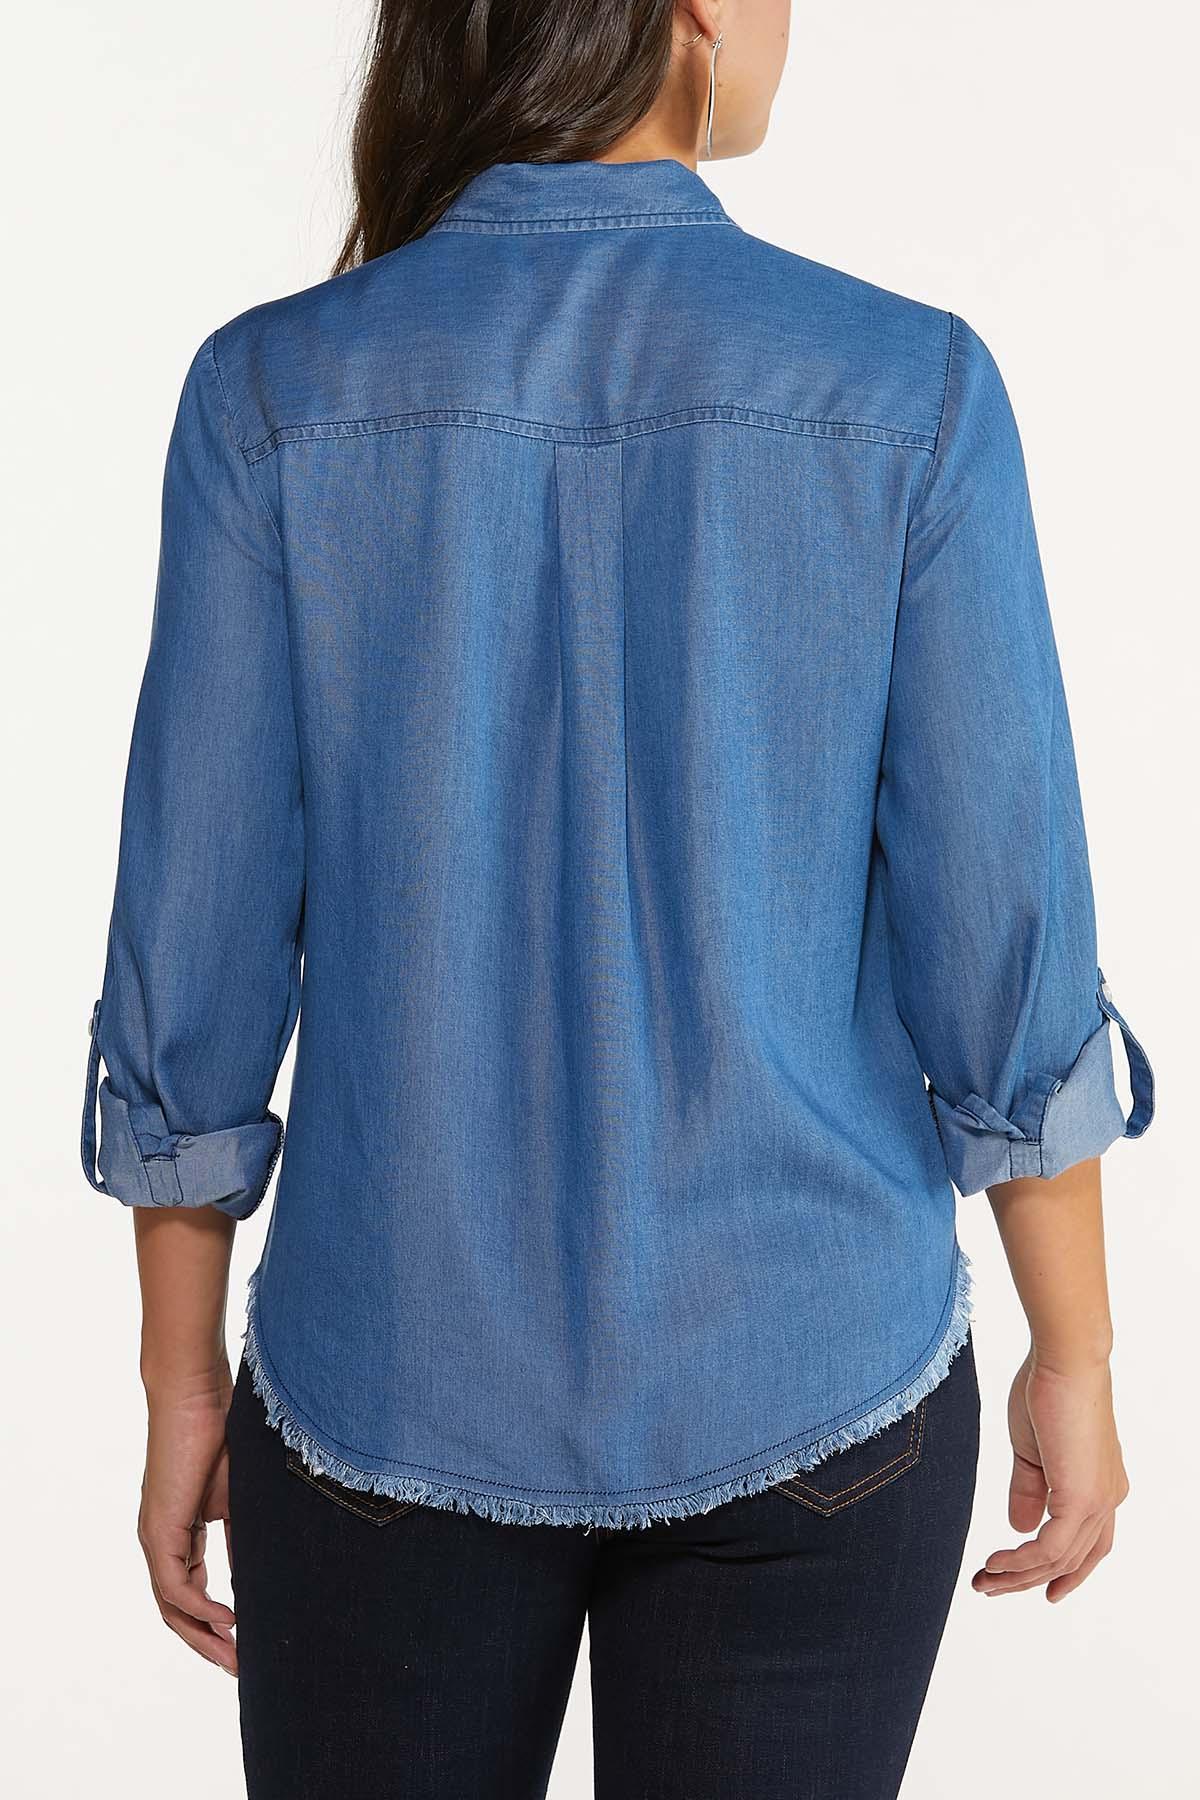 Frayed Chambray Shirt (Item #44643750)